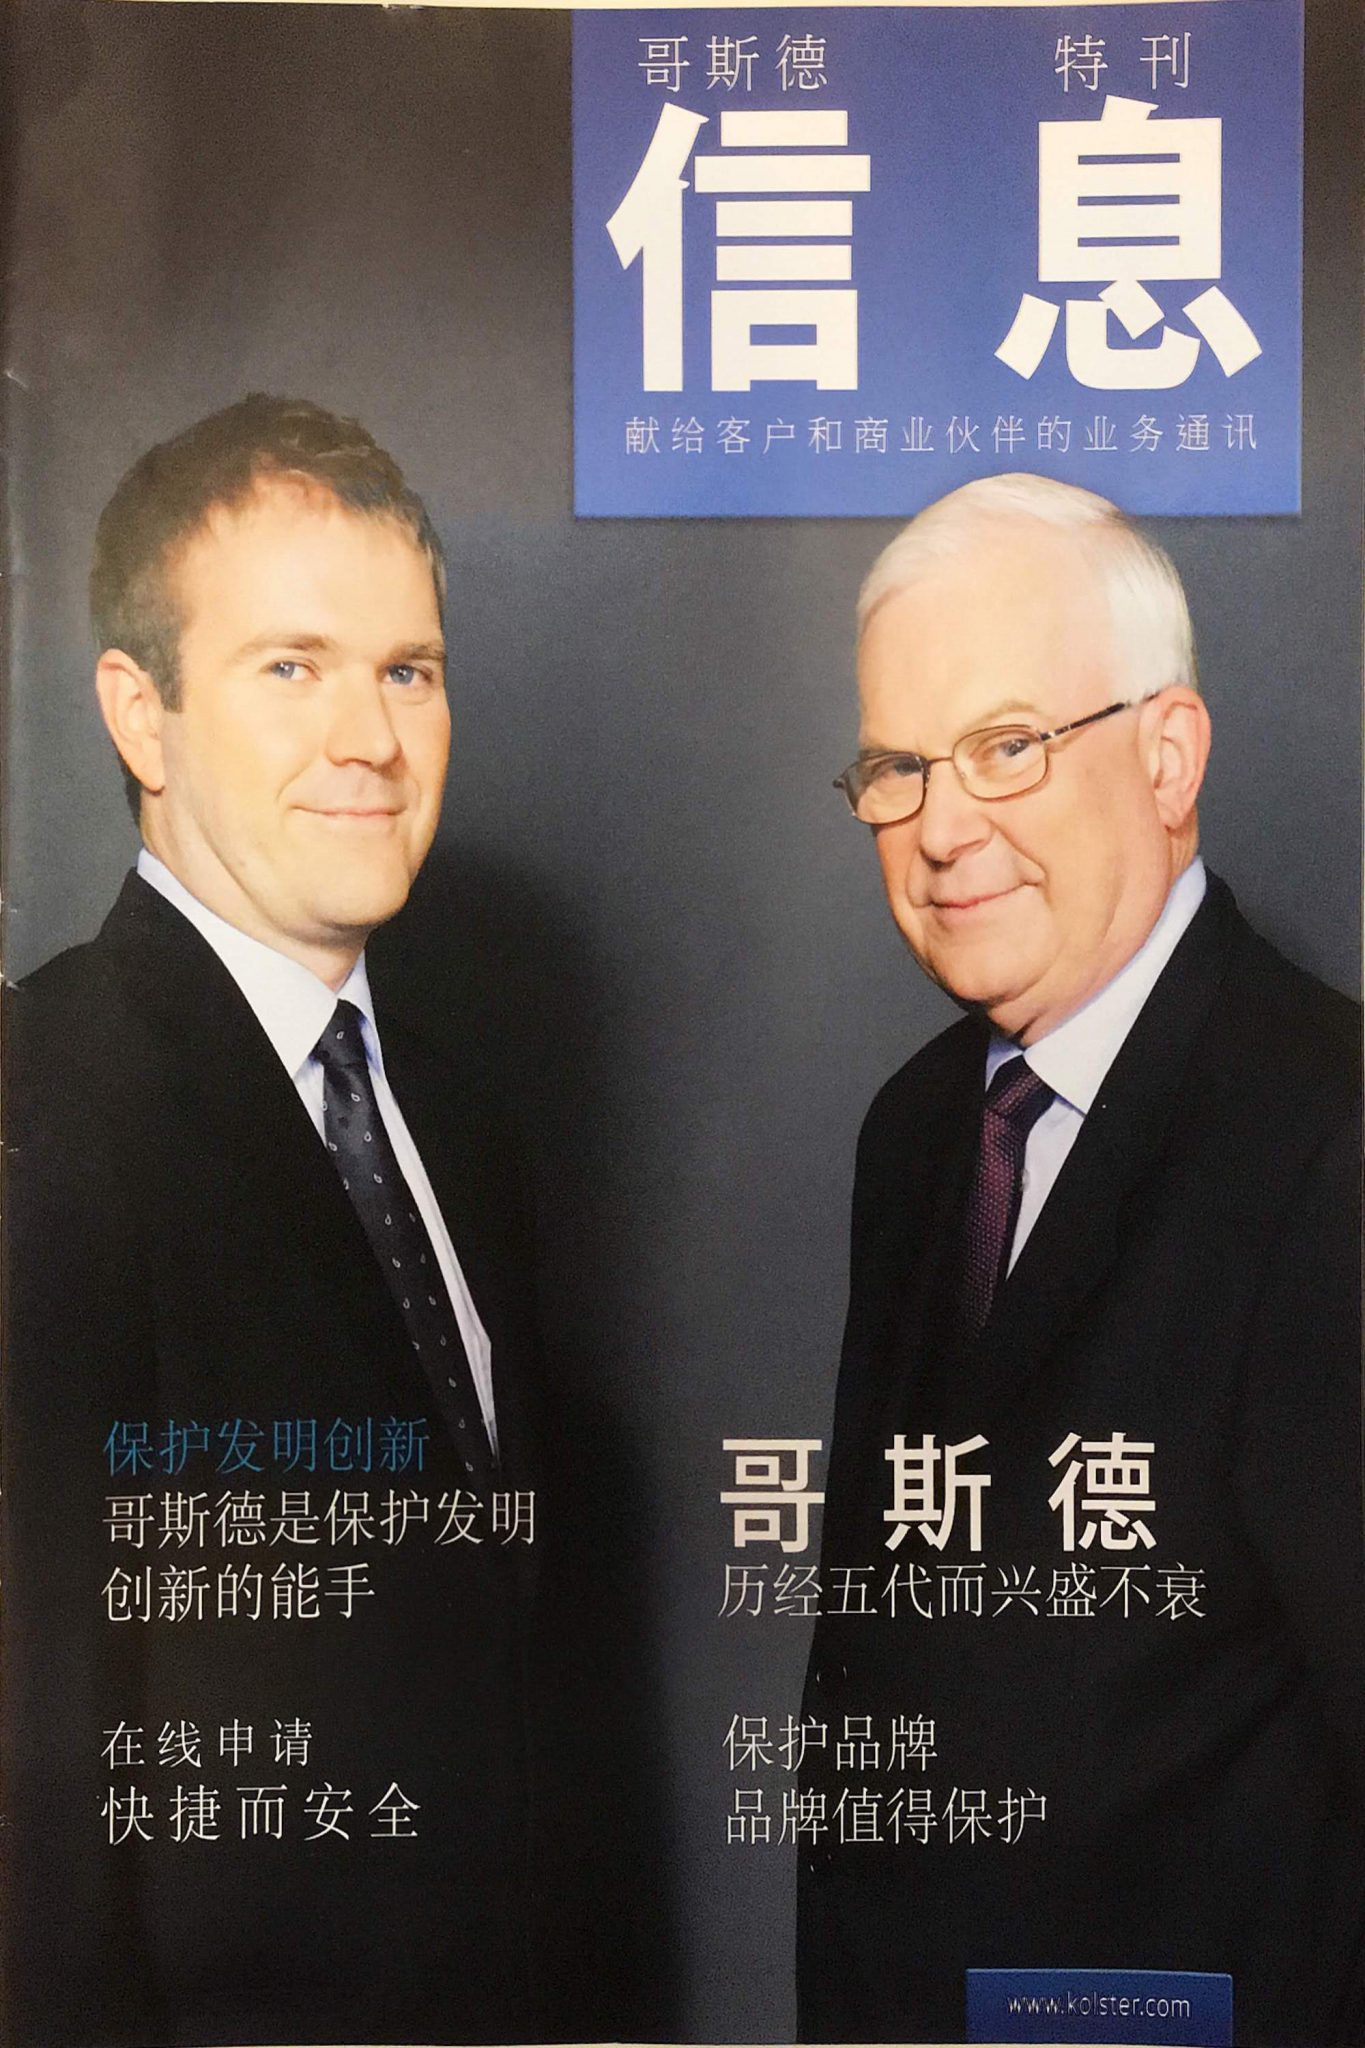 tekway-company-leaflets-brochures-info